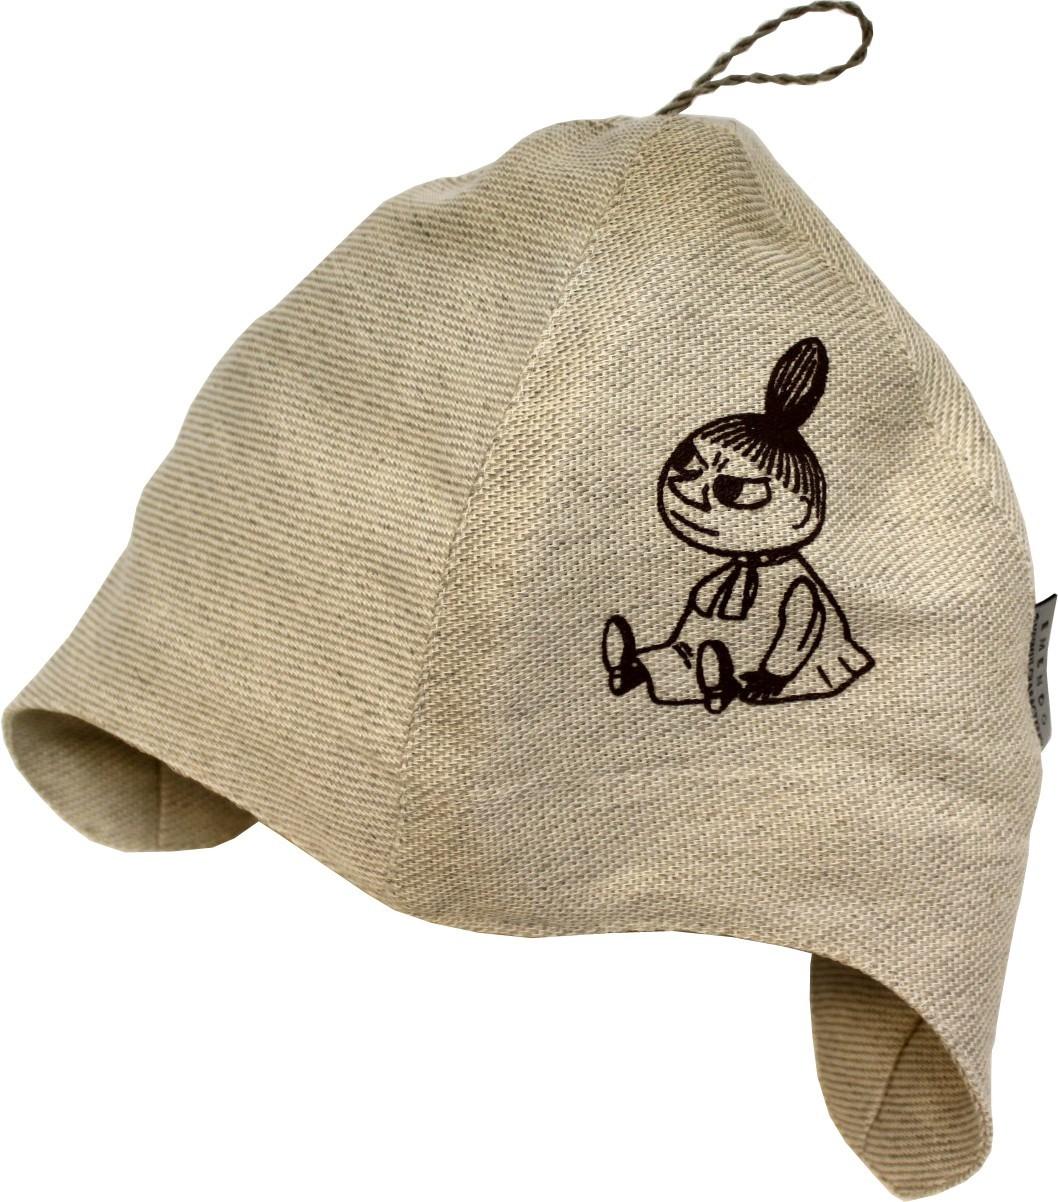 Emendo Little My sauna hat